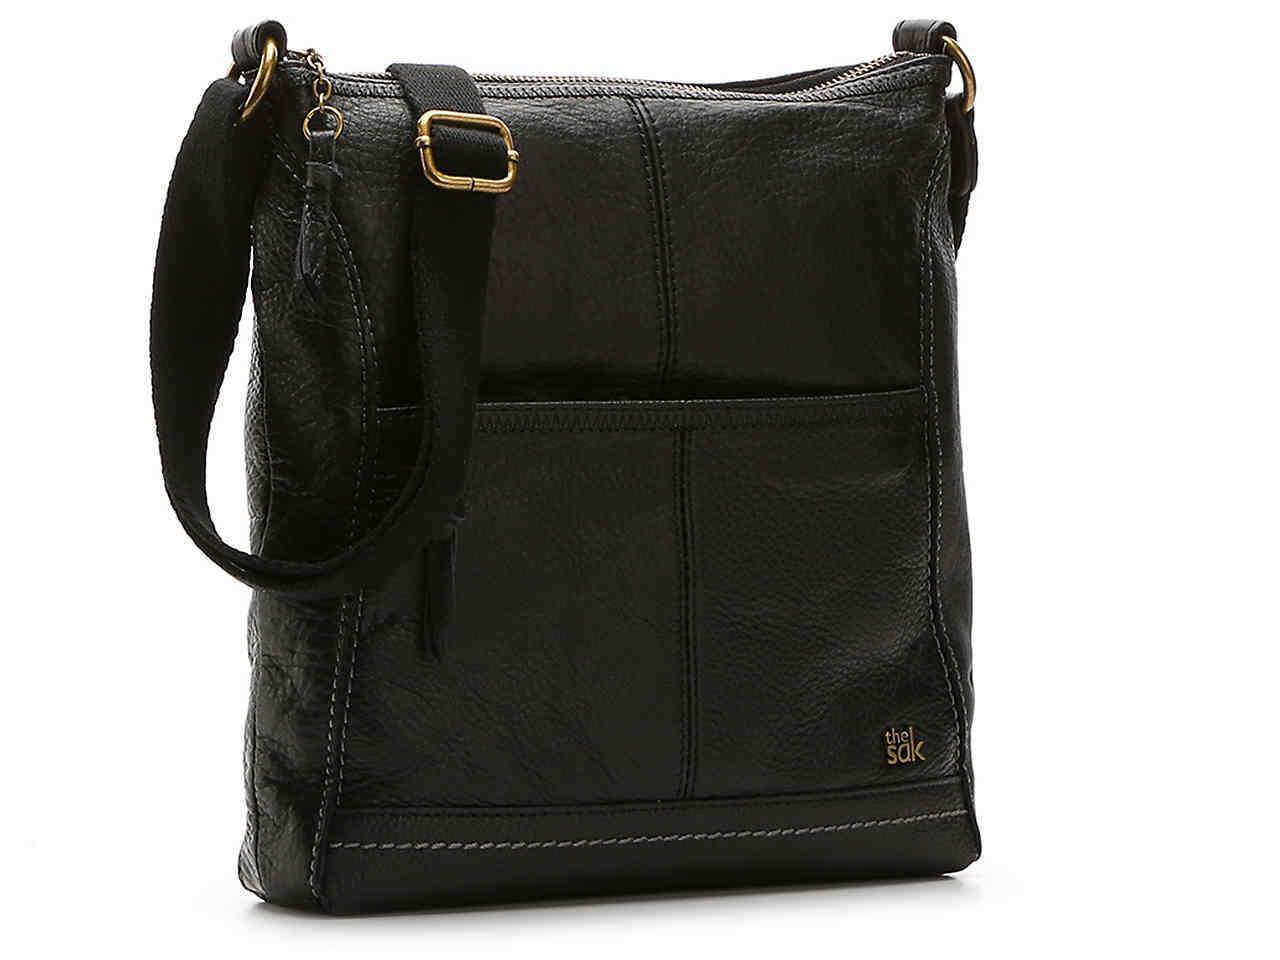 NEW The Sak Leather Iris Crossbody Bag